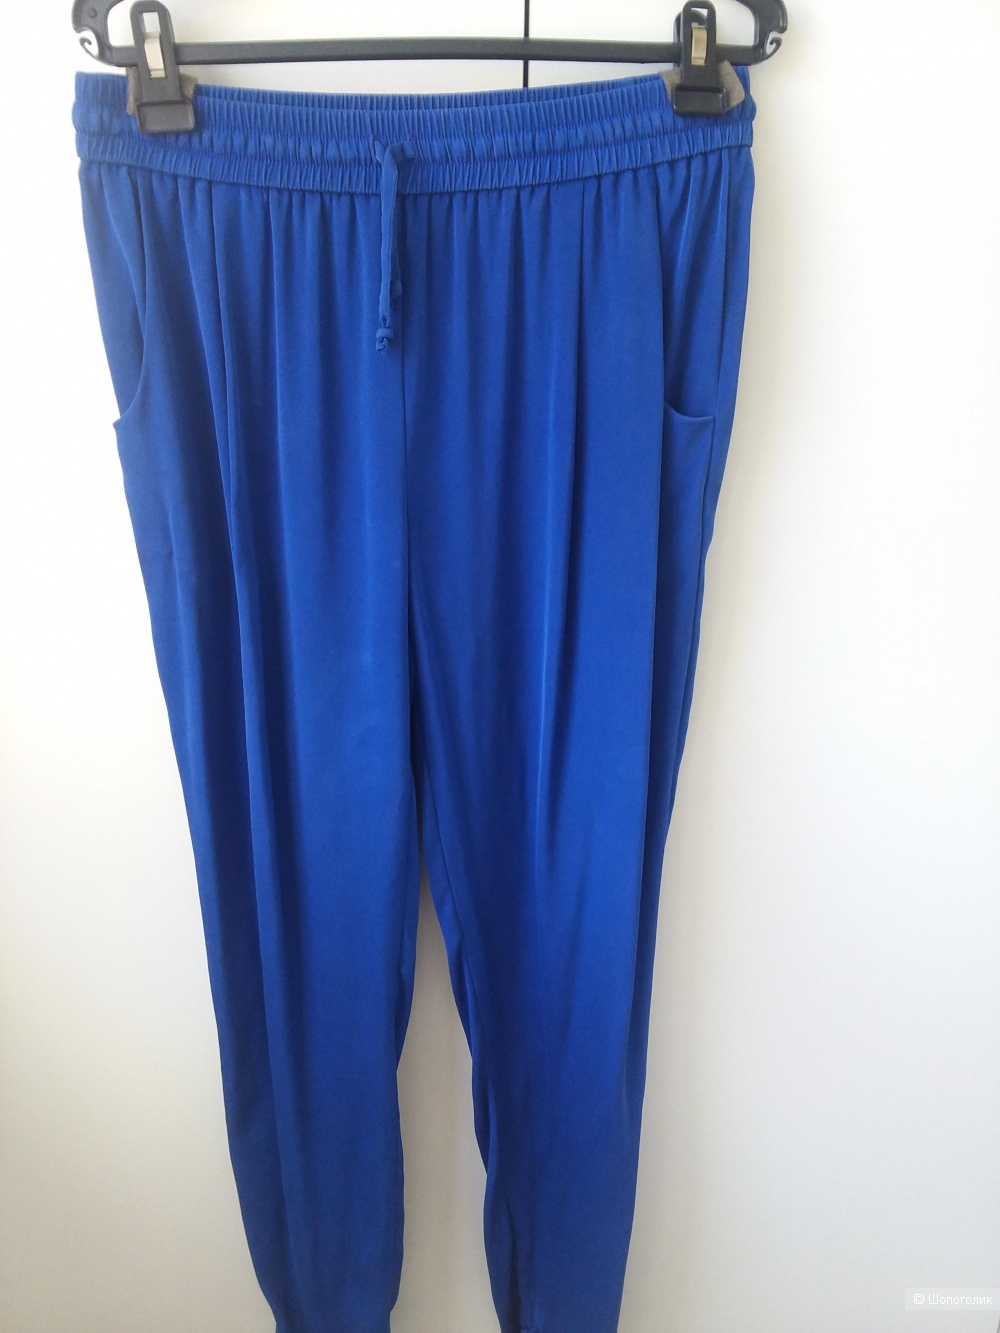 Шёлковые брюки  P.A.R.O.S.H.   М на 44 размер